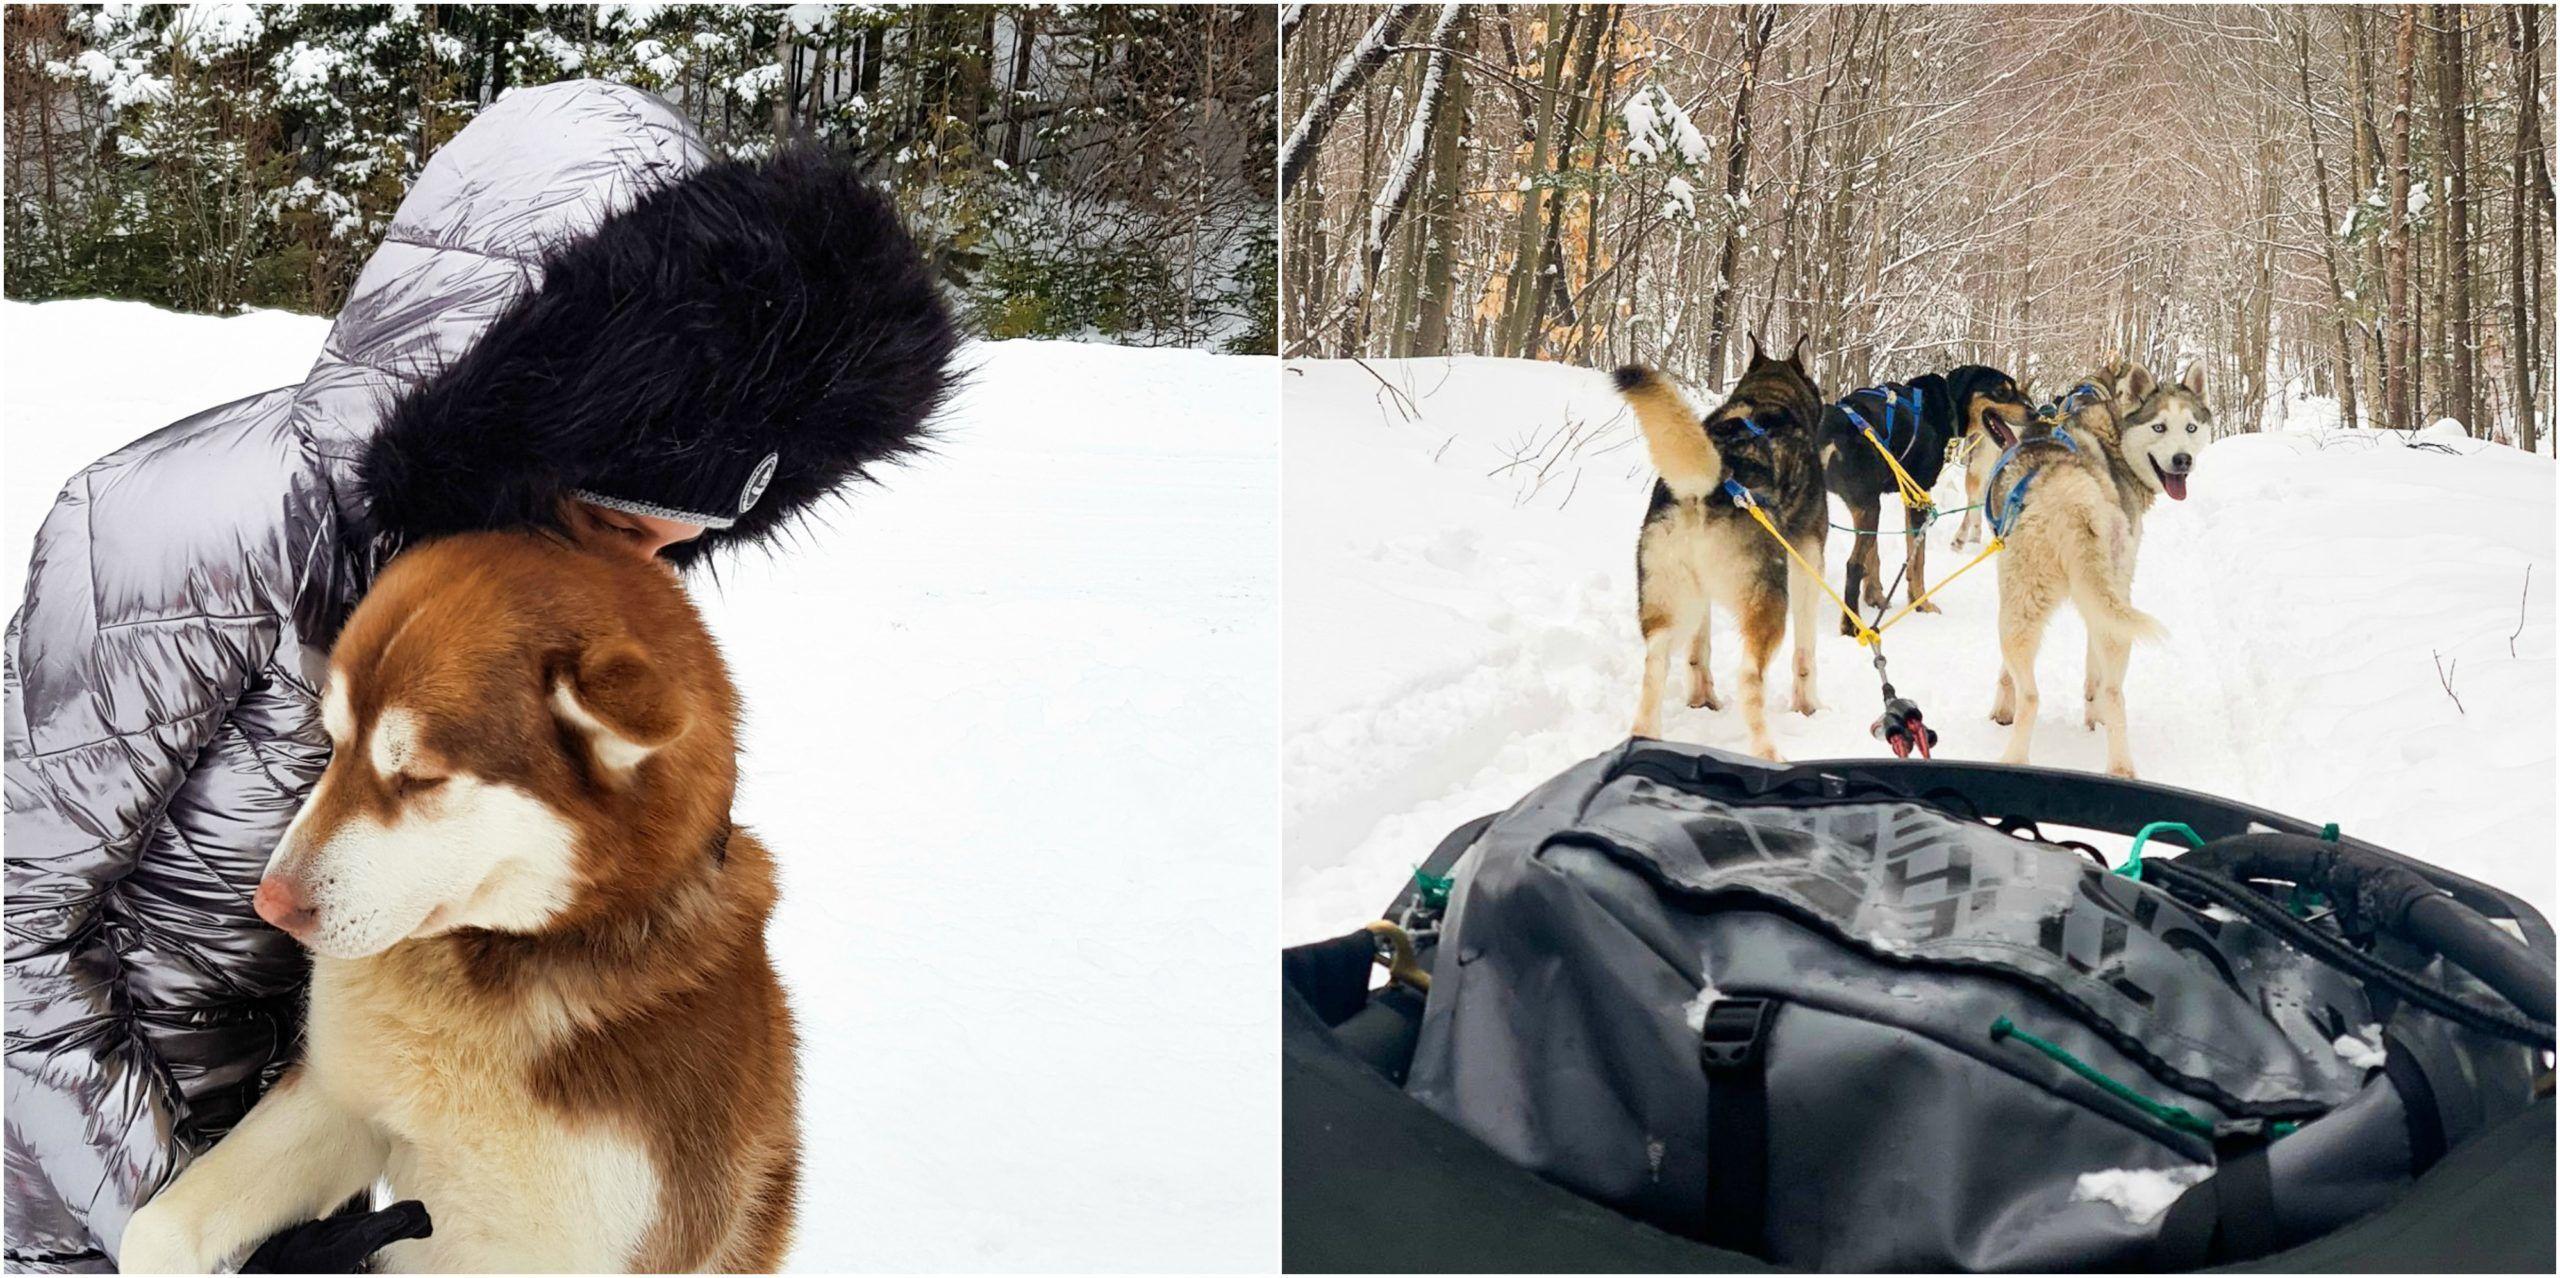 balade en traineau à chiens